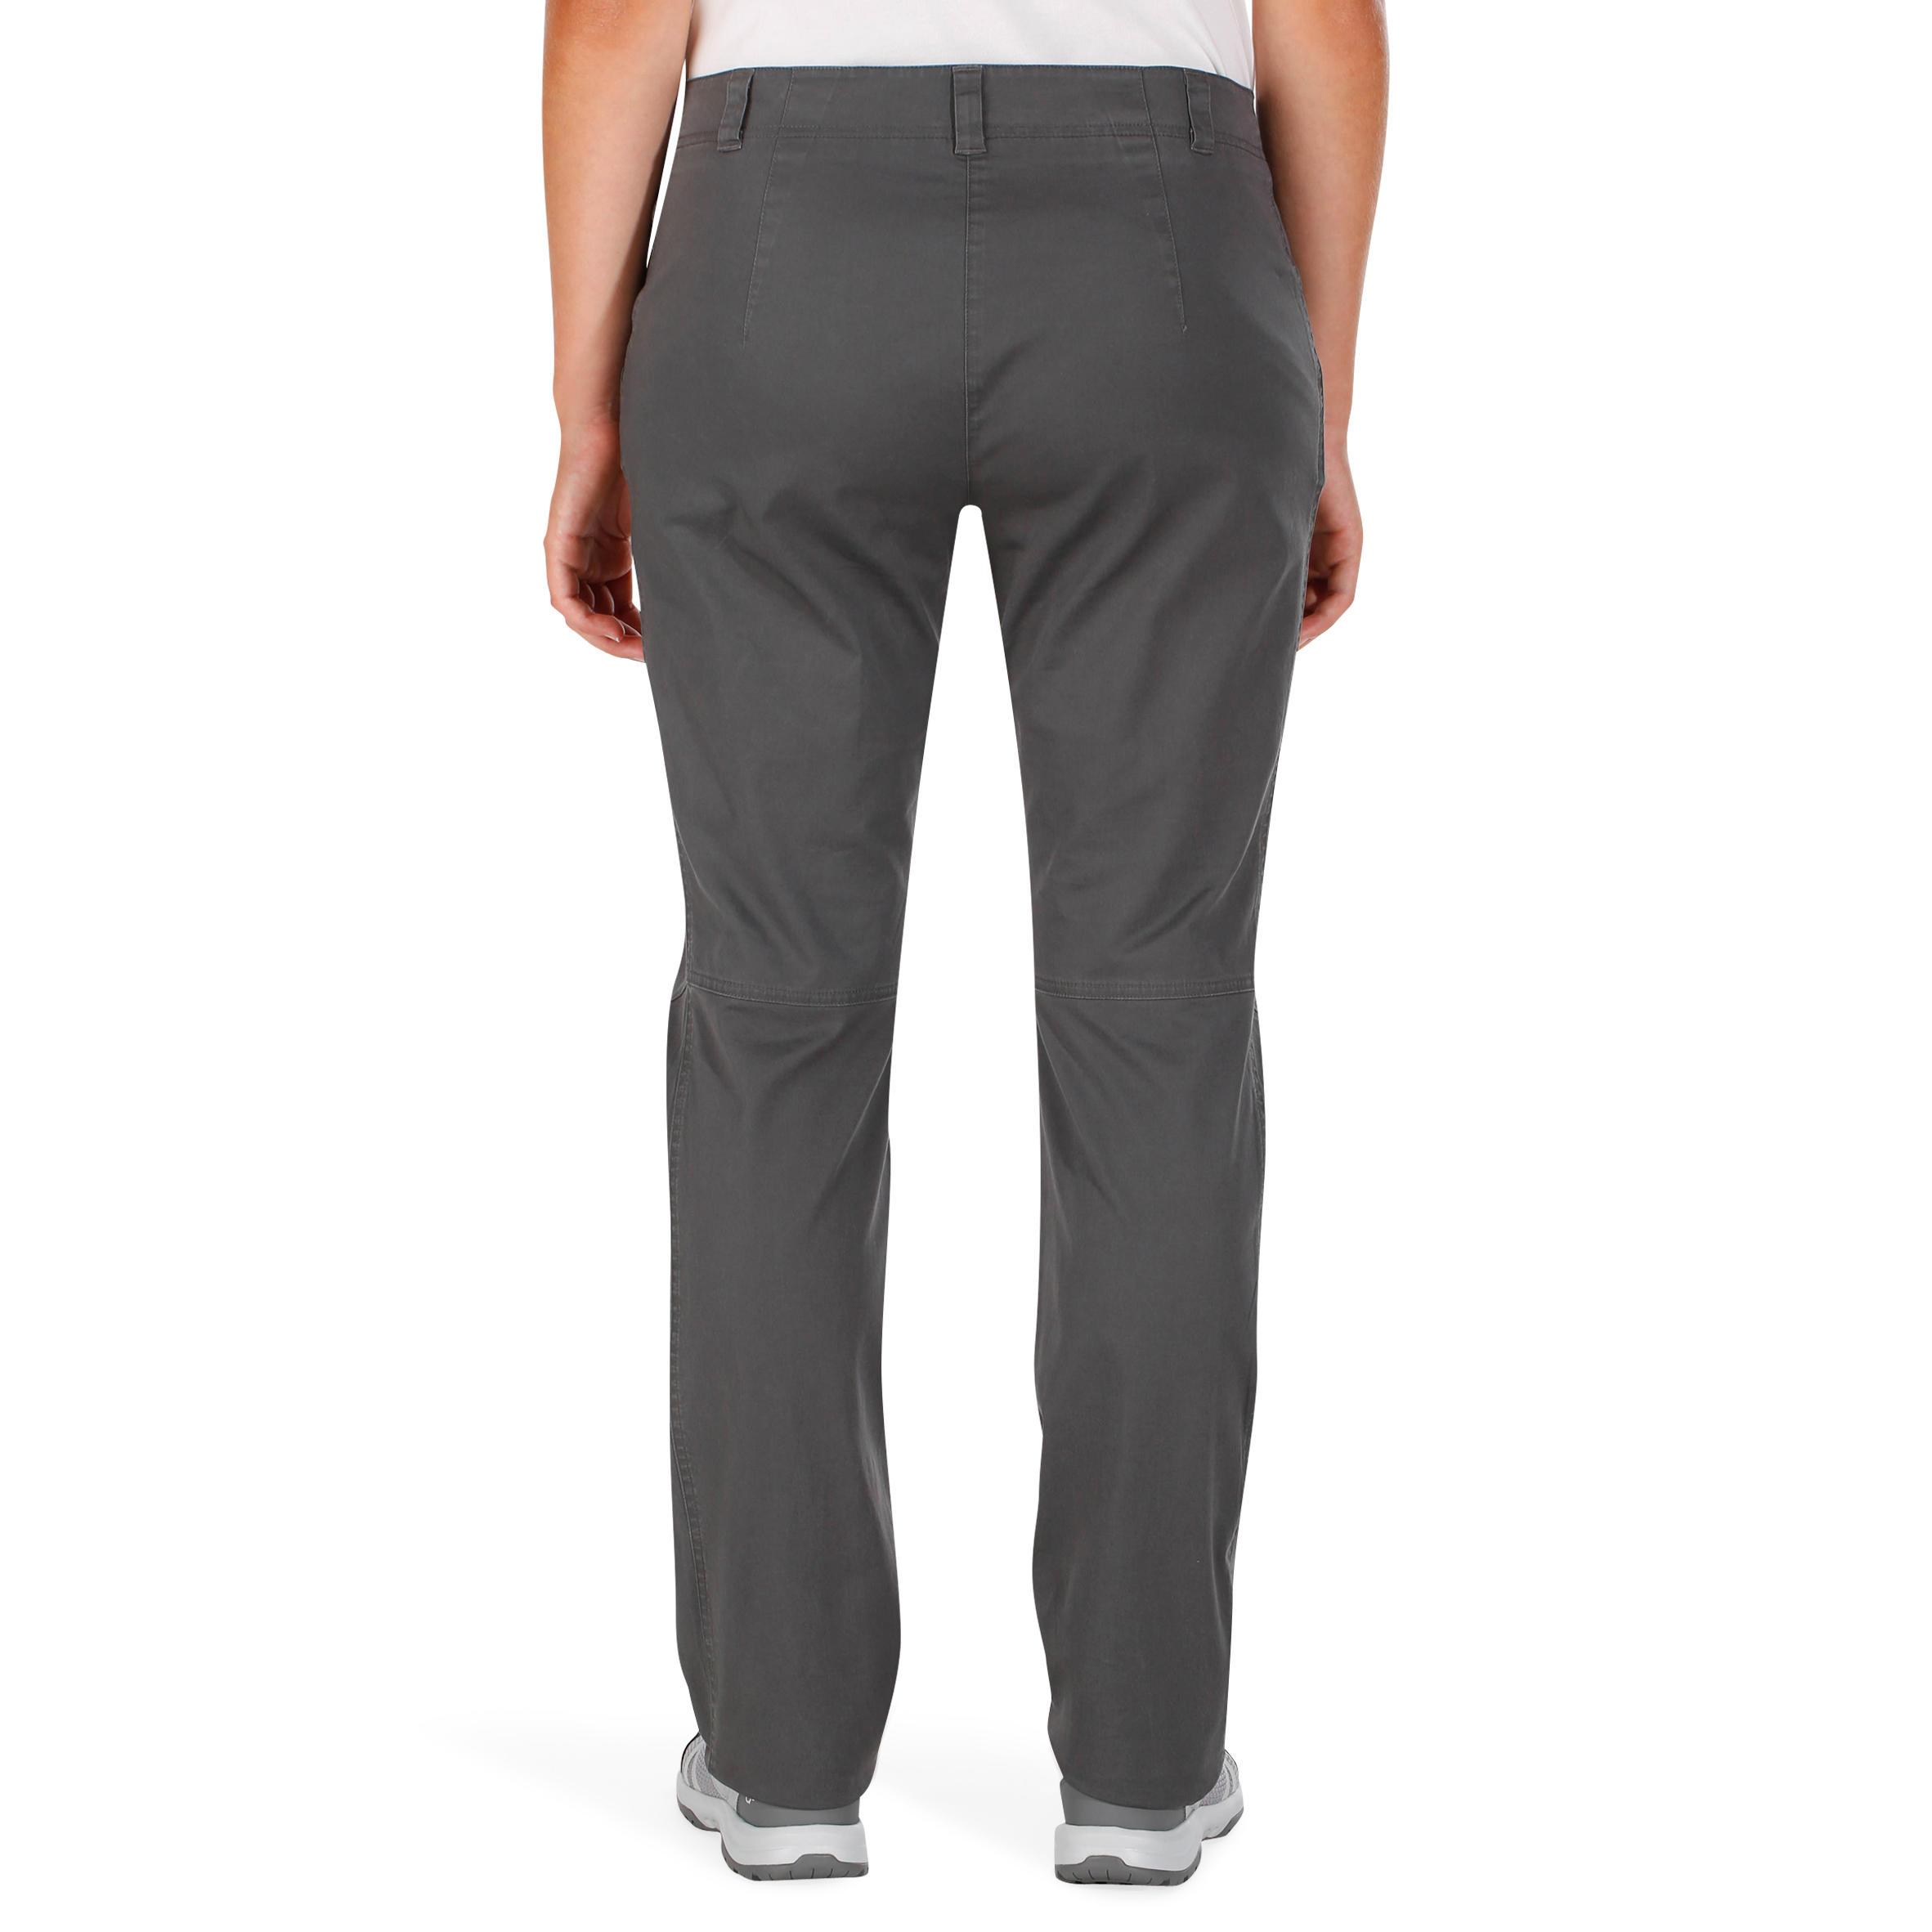 Women's Nature Hiking Trousers NH500 - Grey